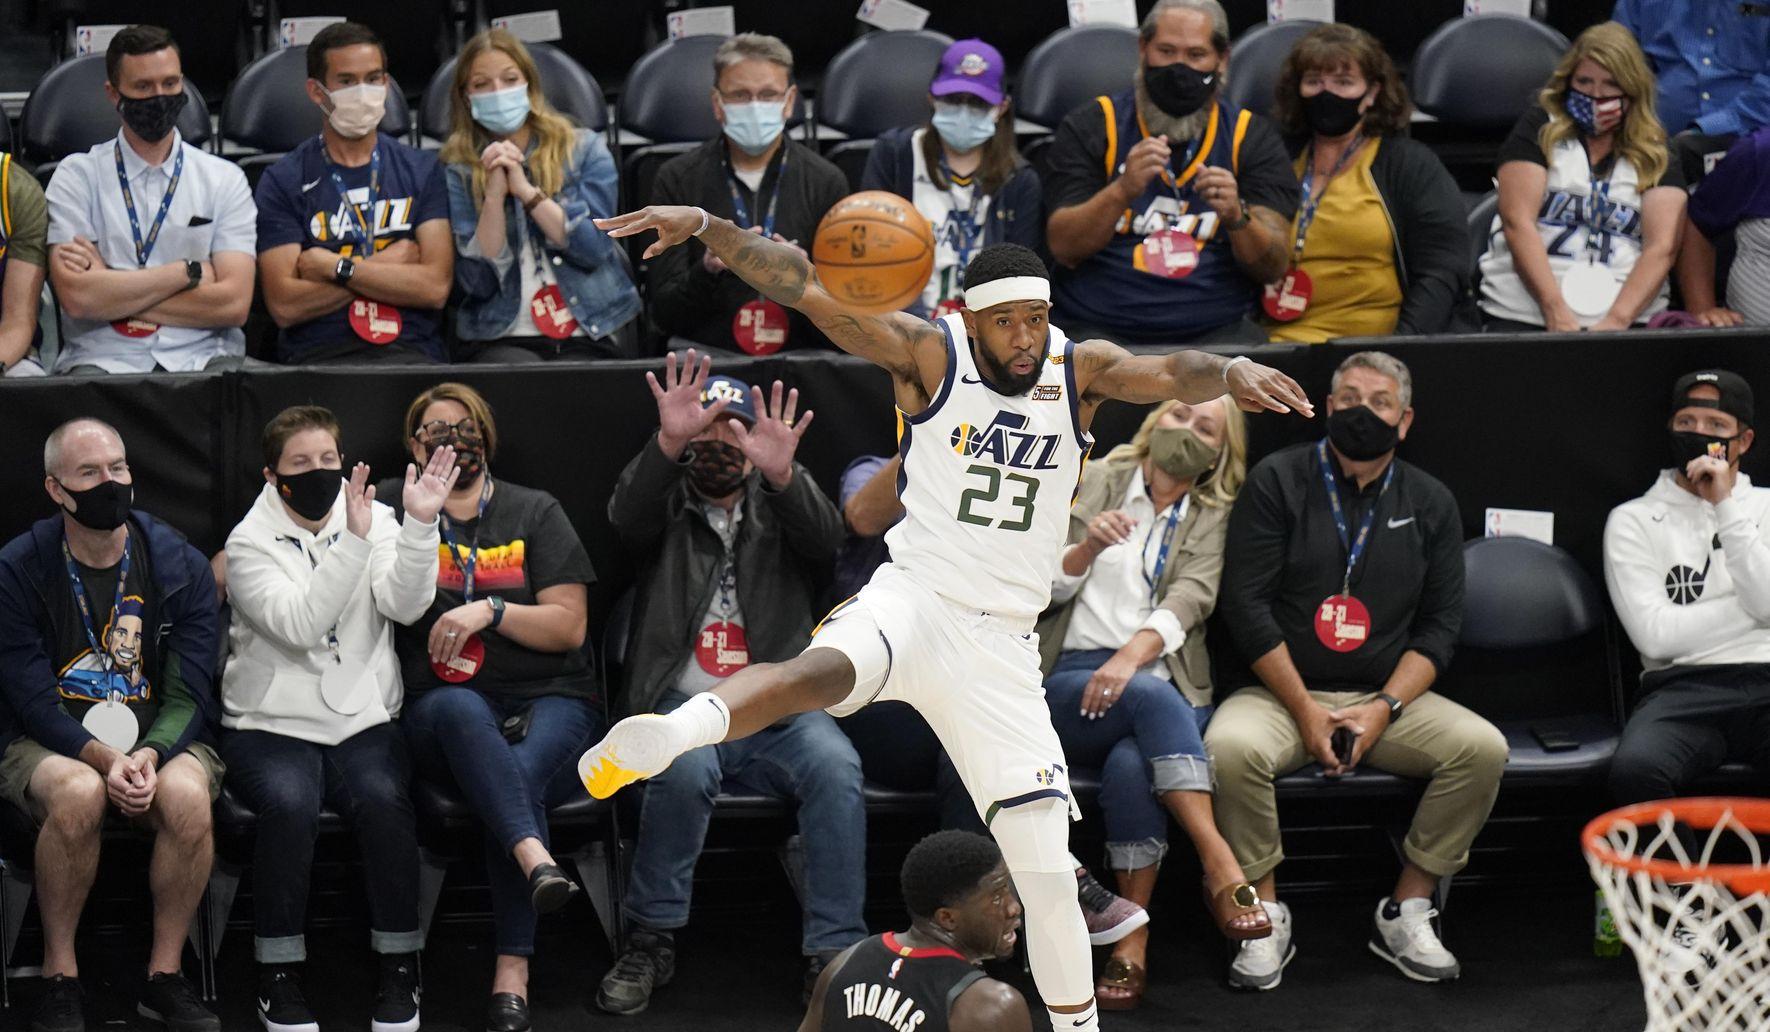 Rockets_jazz_basketball_44253_c95-0-5305-3038_s1770x1032